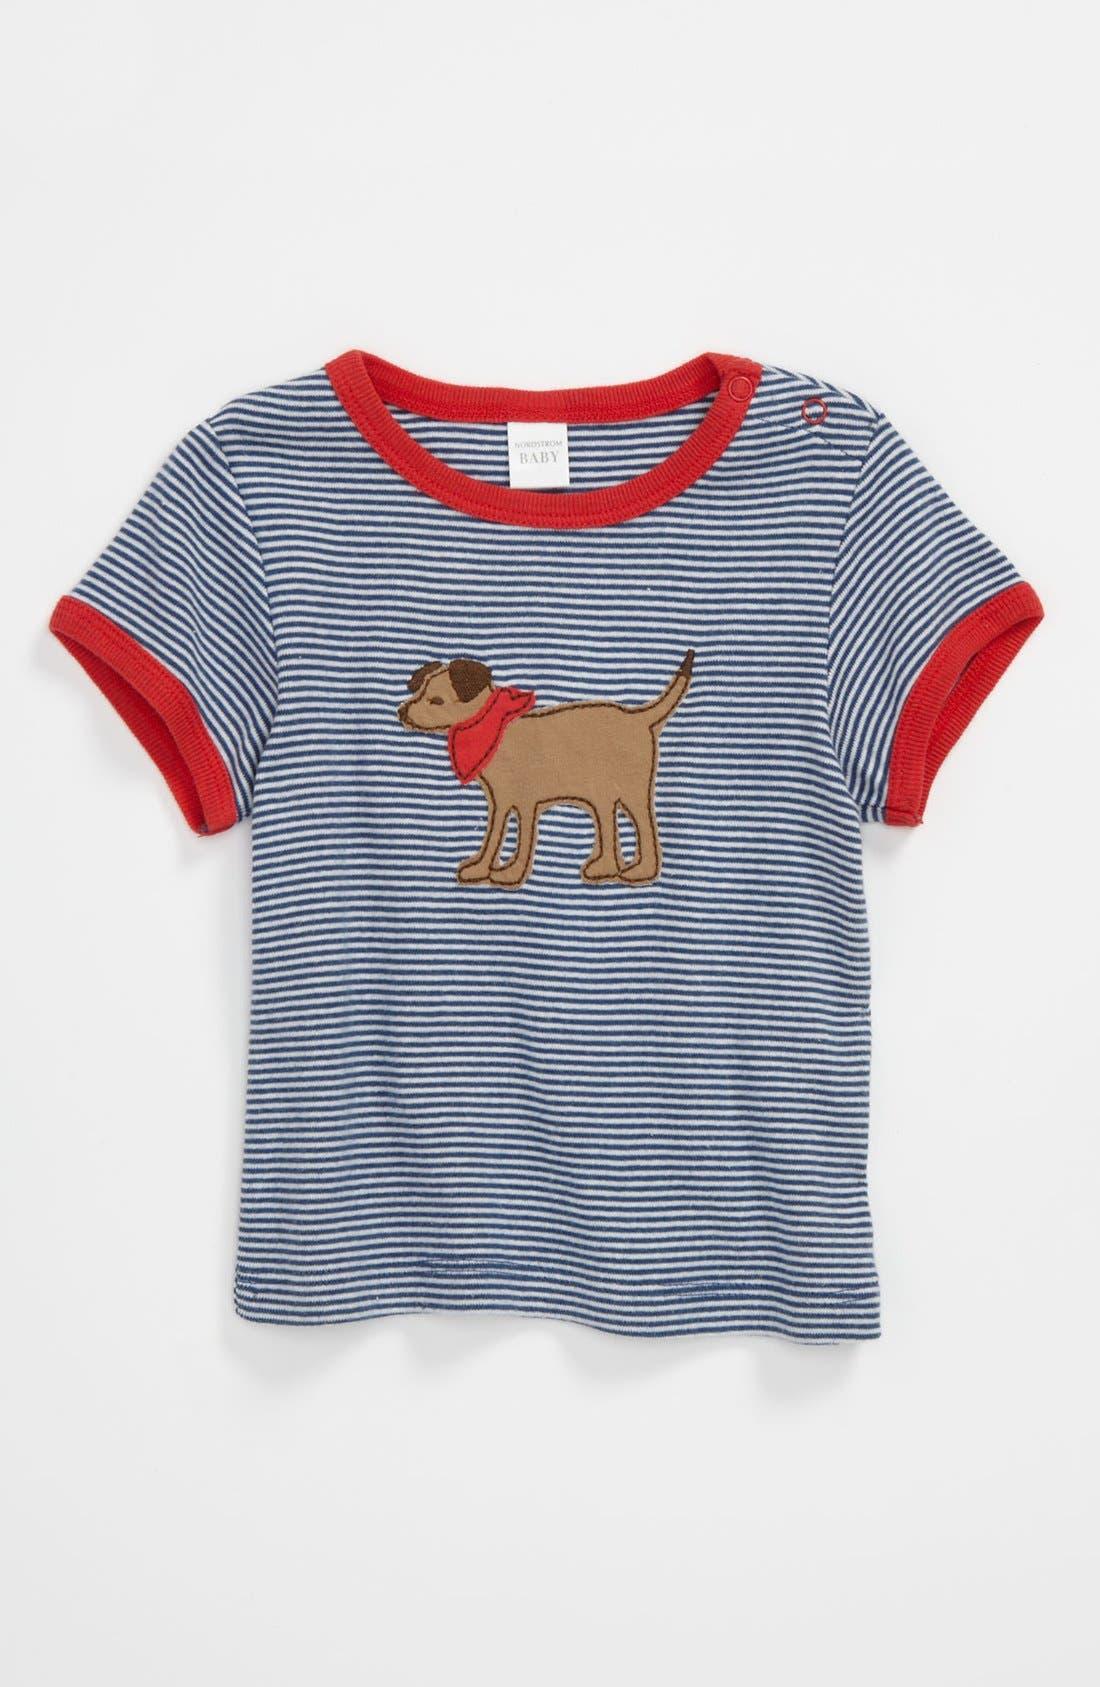 Main Image - Nordstrom Baby Appliqué T-Shirt (Baby)